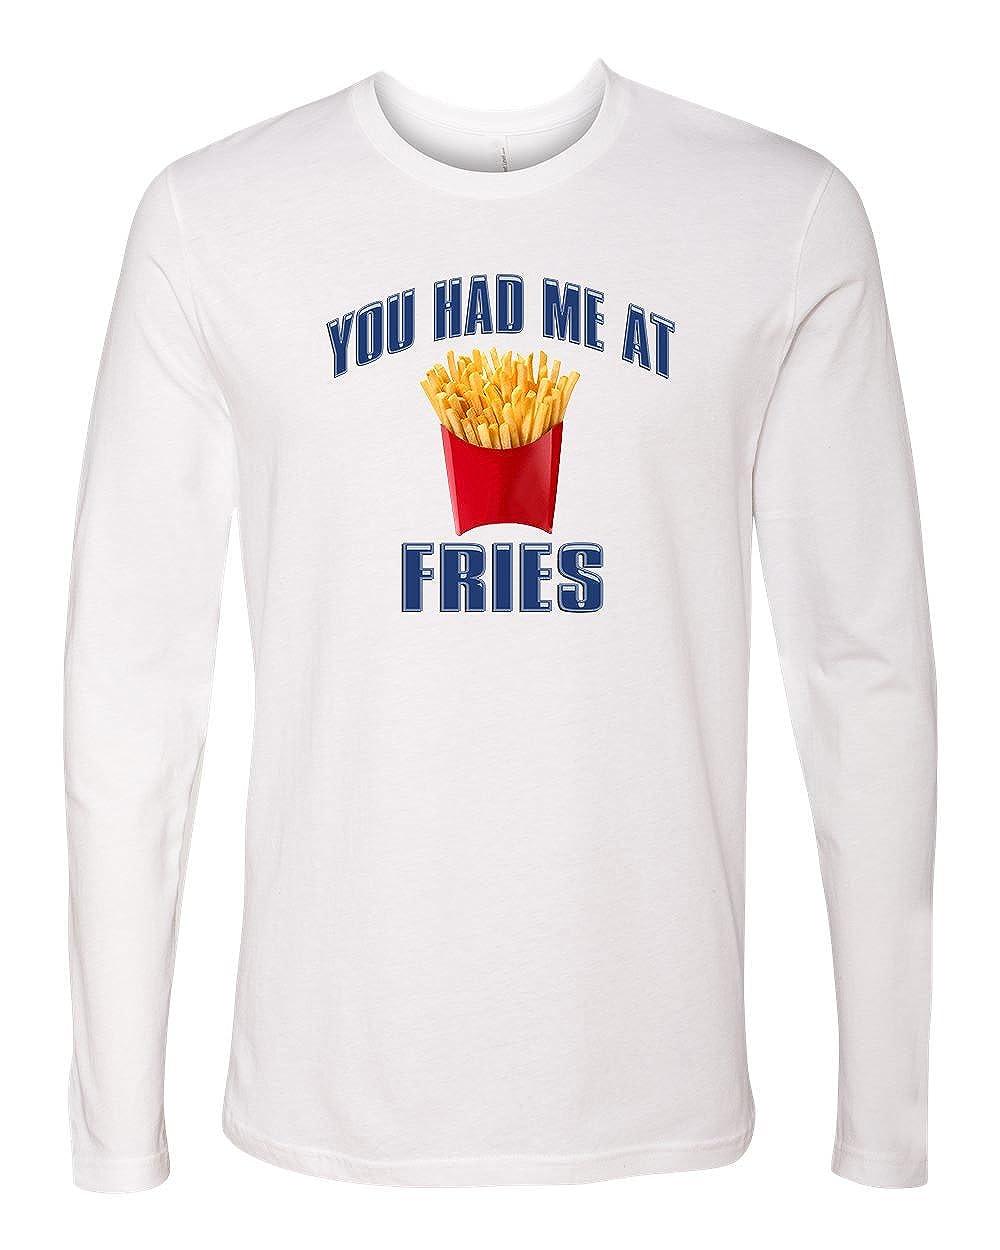 Custom Apparel R Us Had Me at Fries Funny Saying Mens Long Sleeve